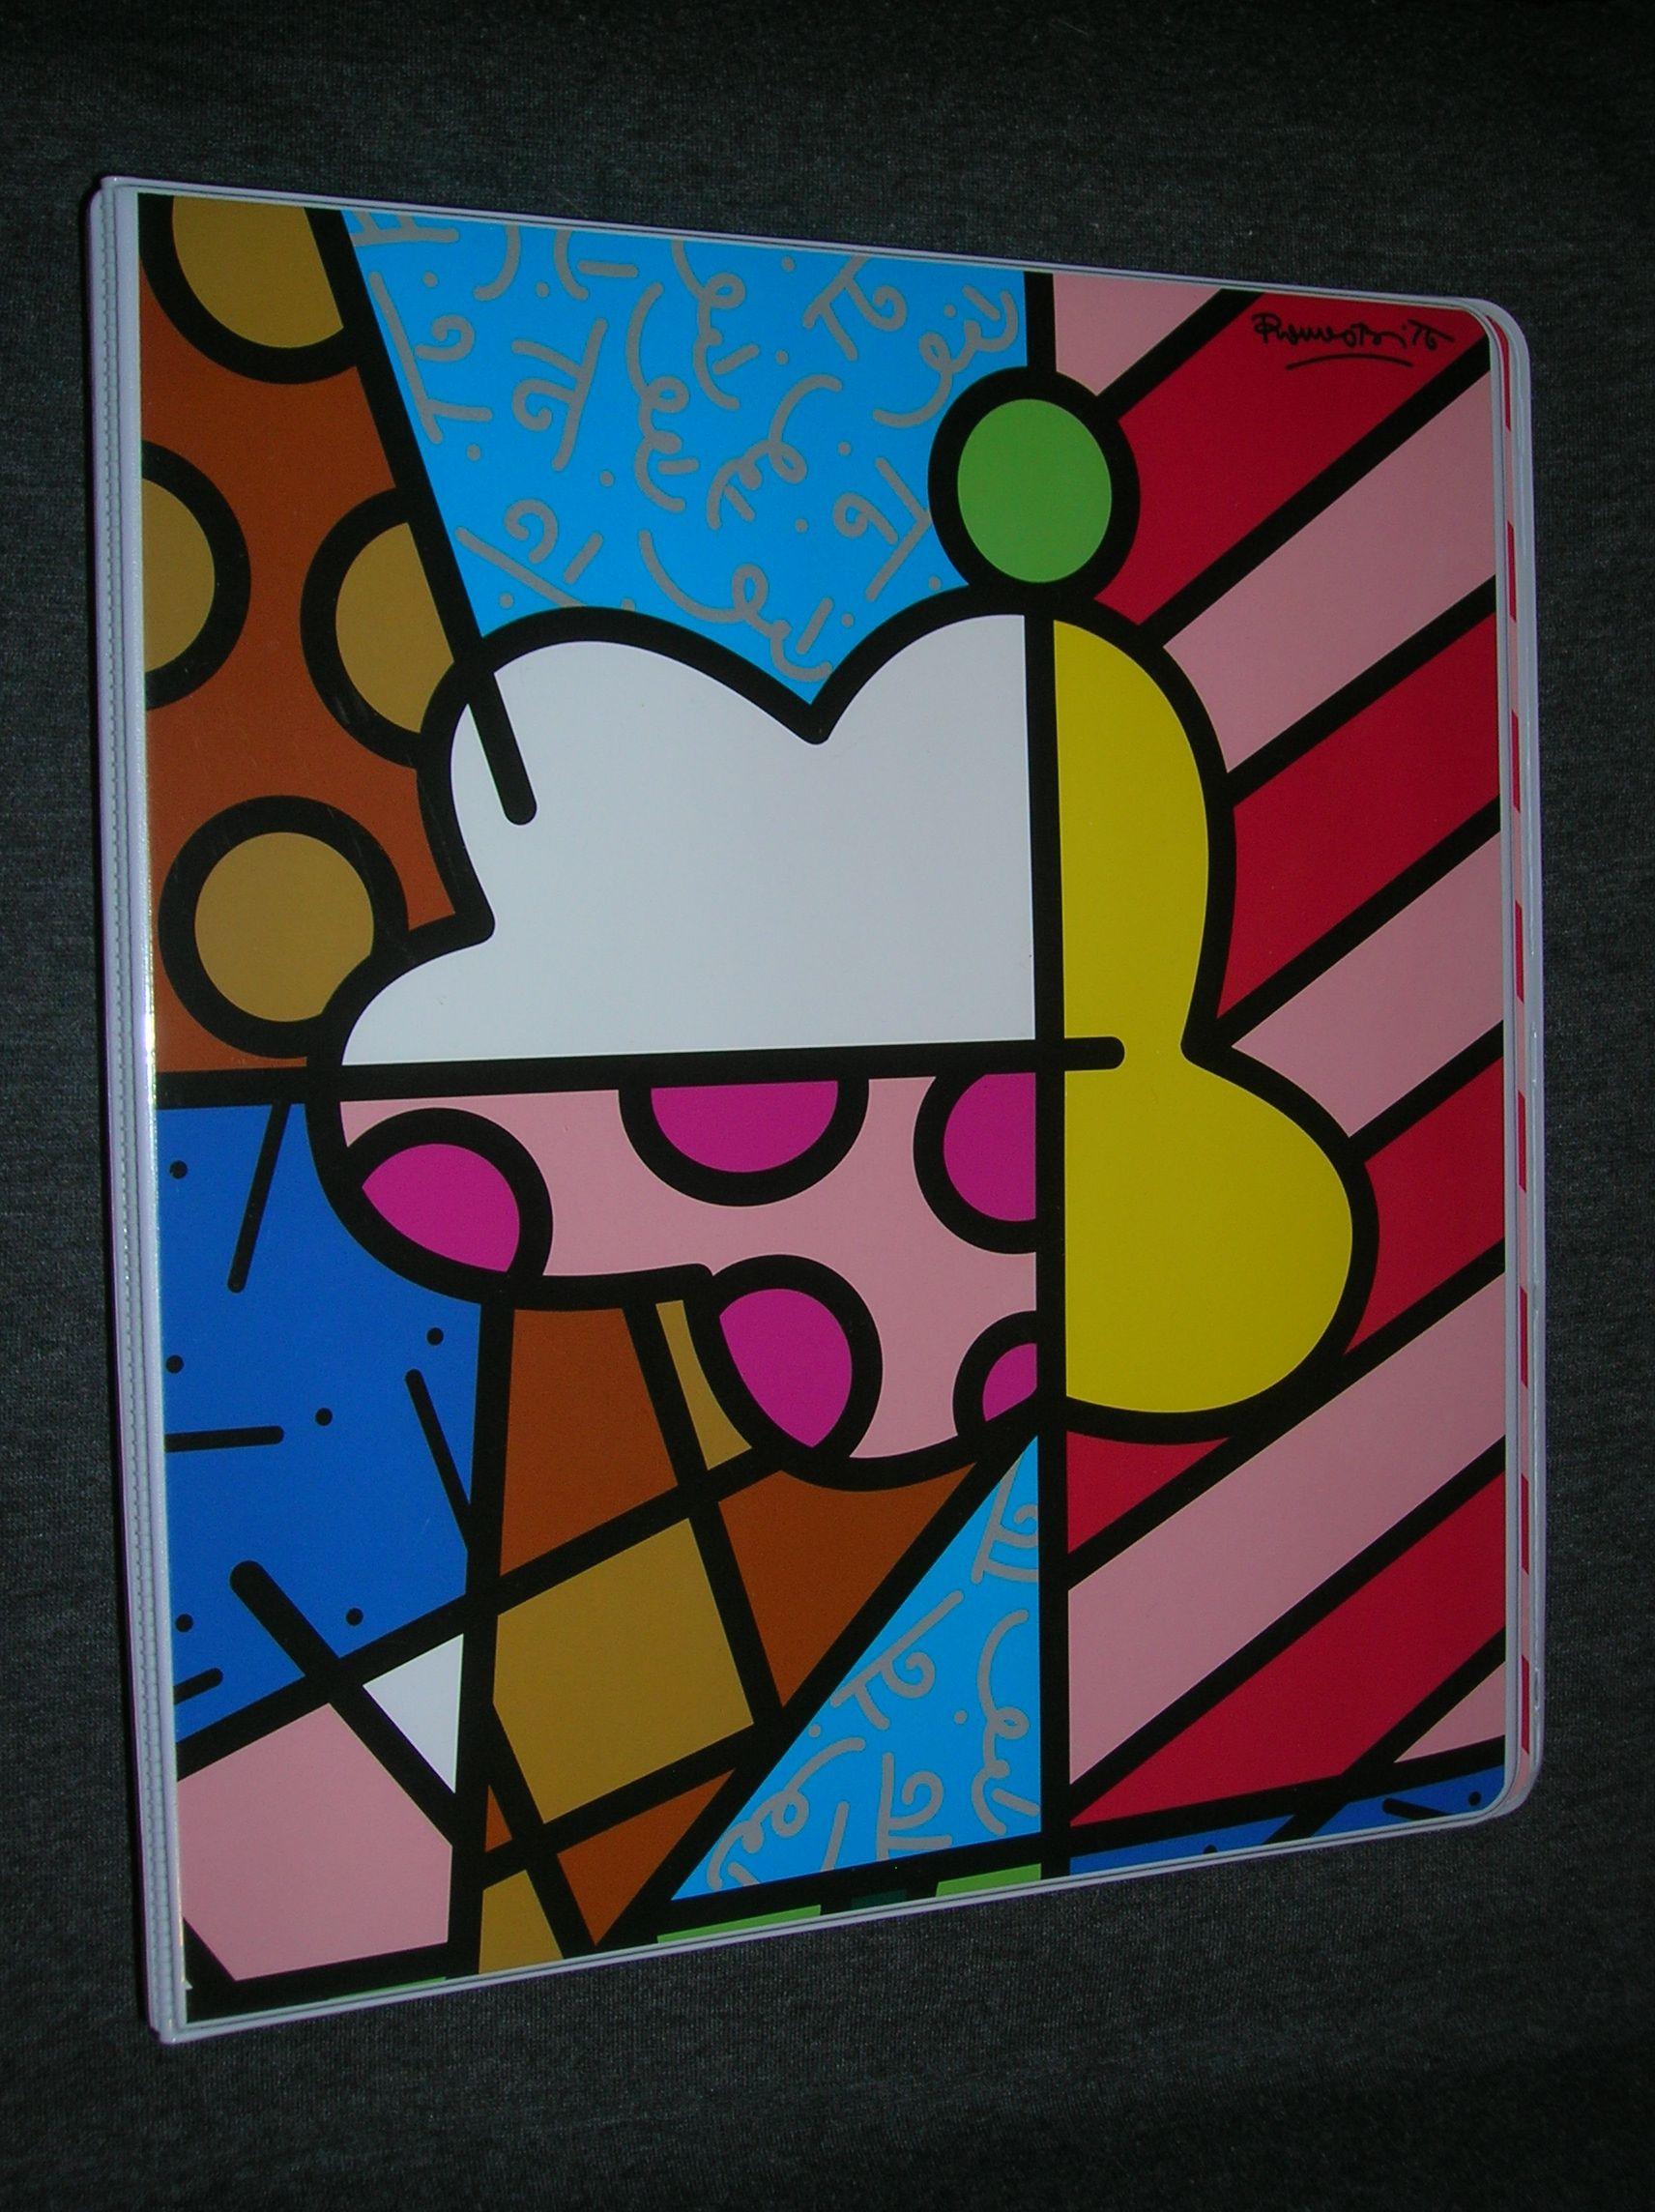 Rare Pop Art Designer Notebook Artist Romero Britto 3 Ring Binder School Office Romero Britto Art Romero Britto Britto Art